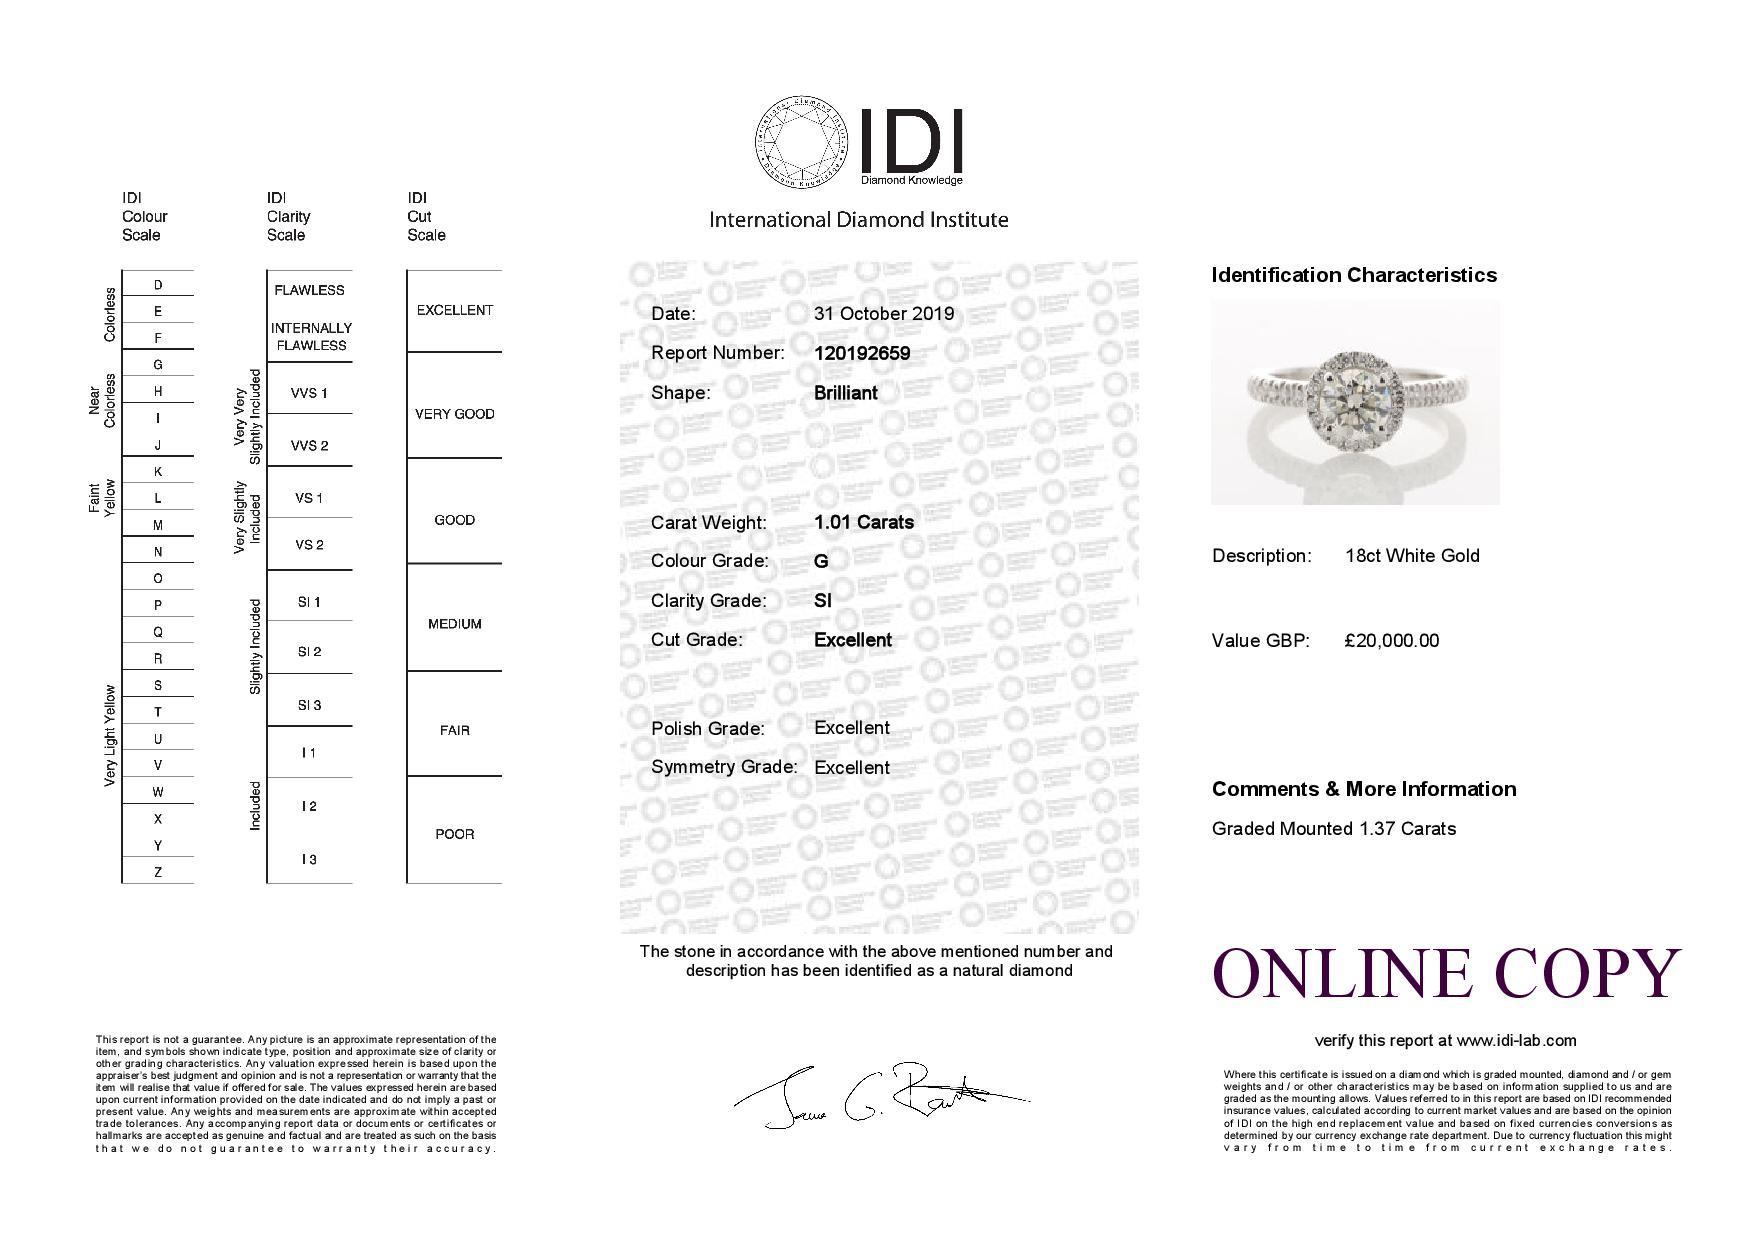 18ct White Gold Halo Set Ring 1.37 Carats - Image 5 of 5